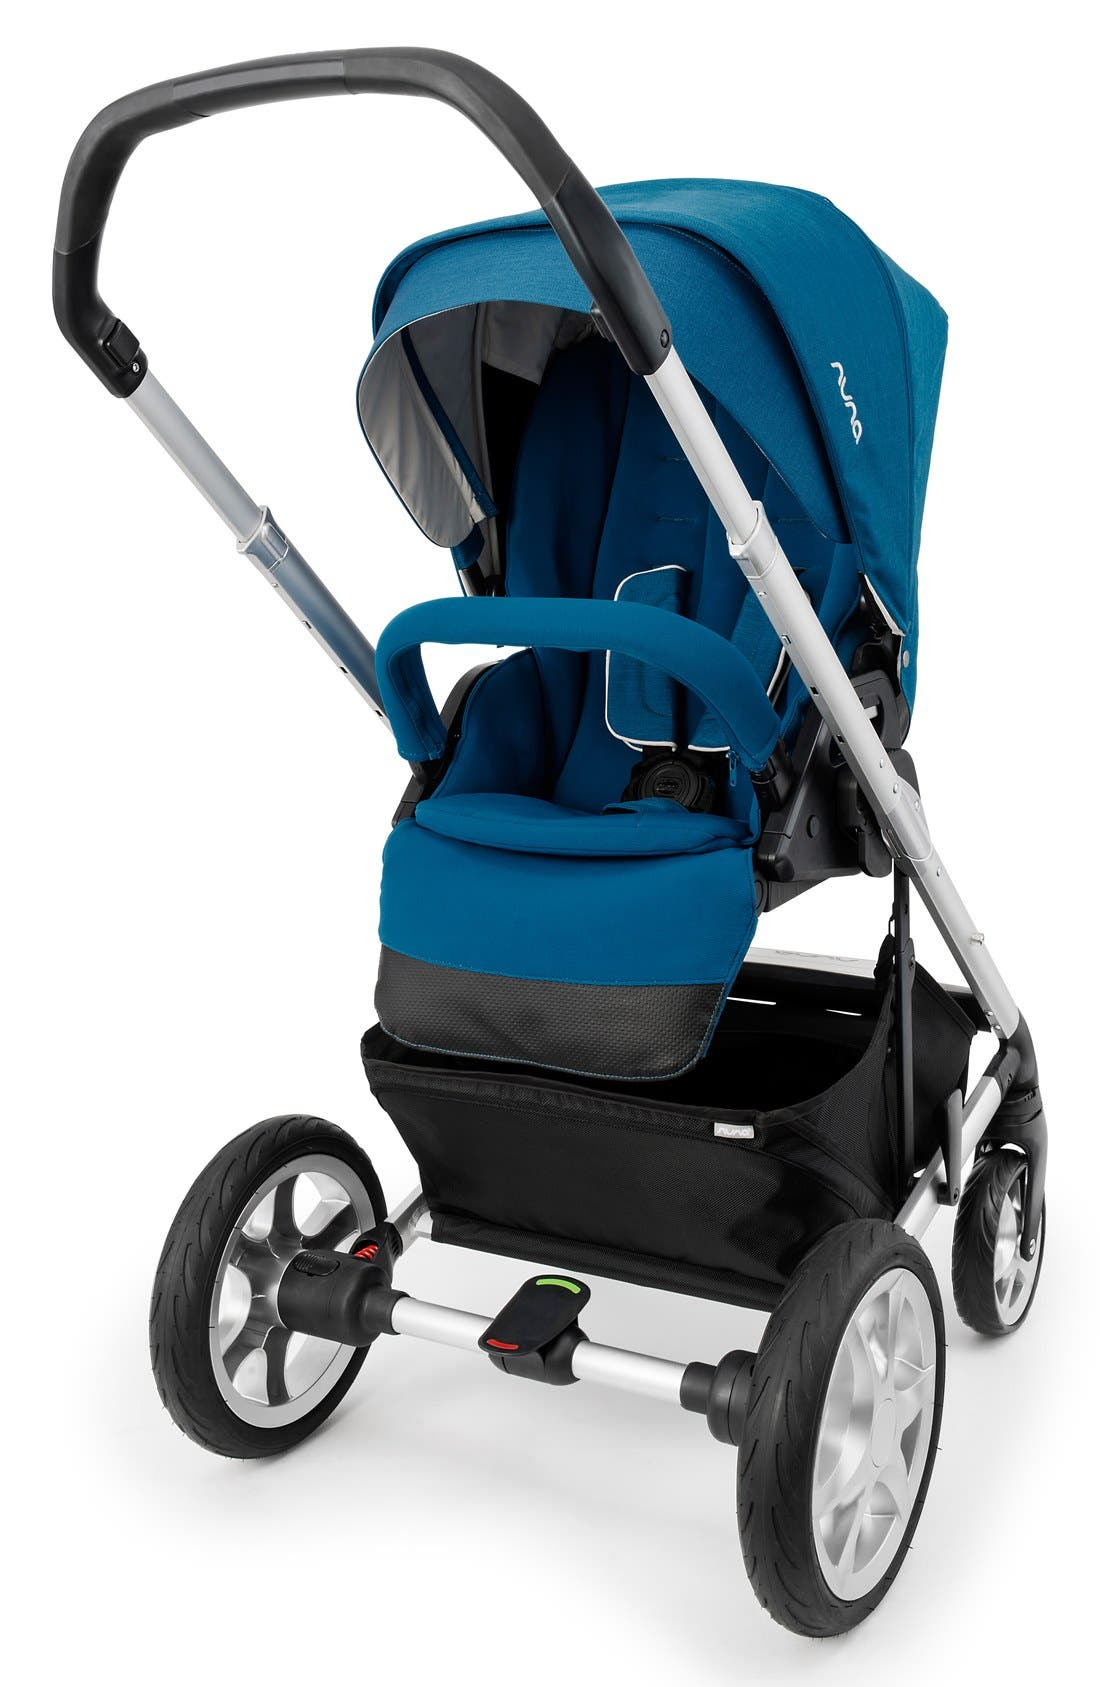 Main Image - nuna 'MIXX™' Three Mode Stroller with All Terrain Tires